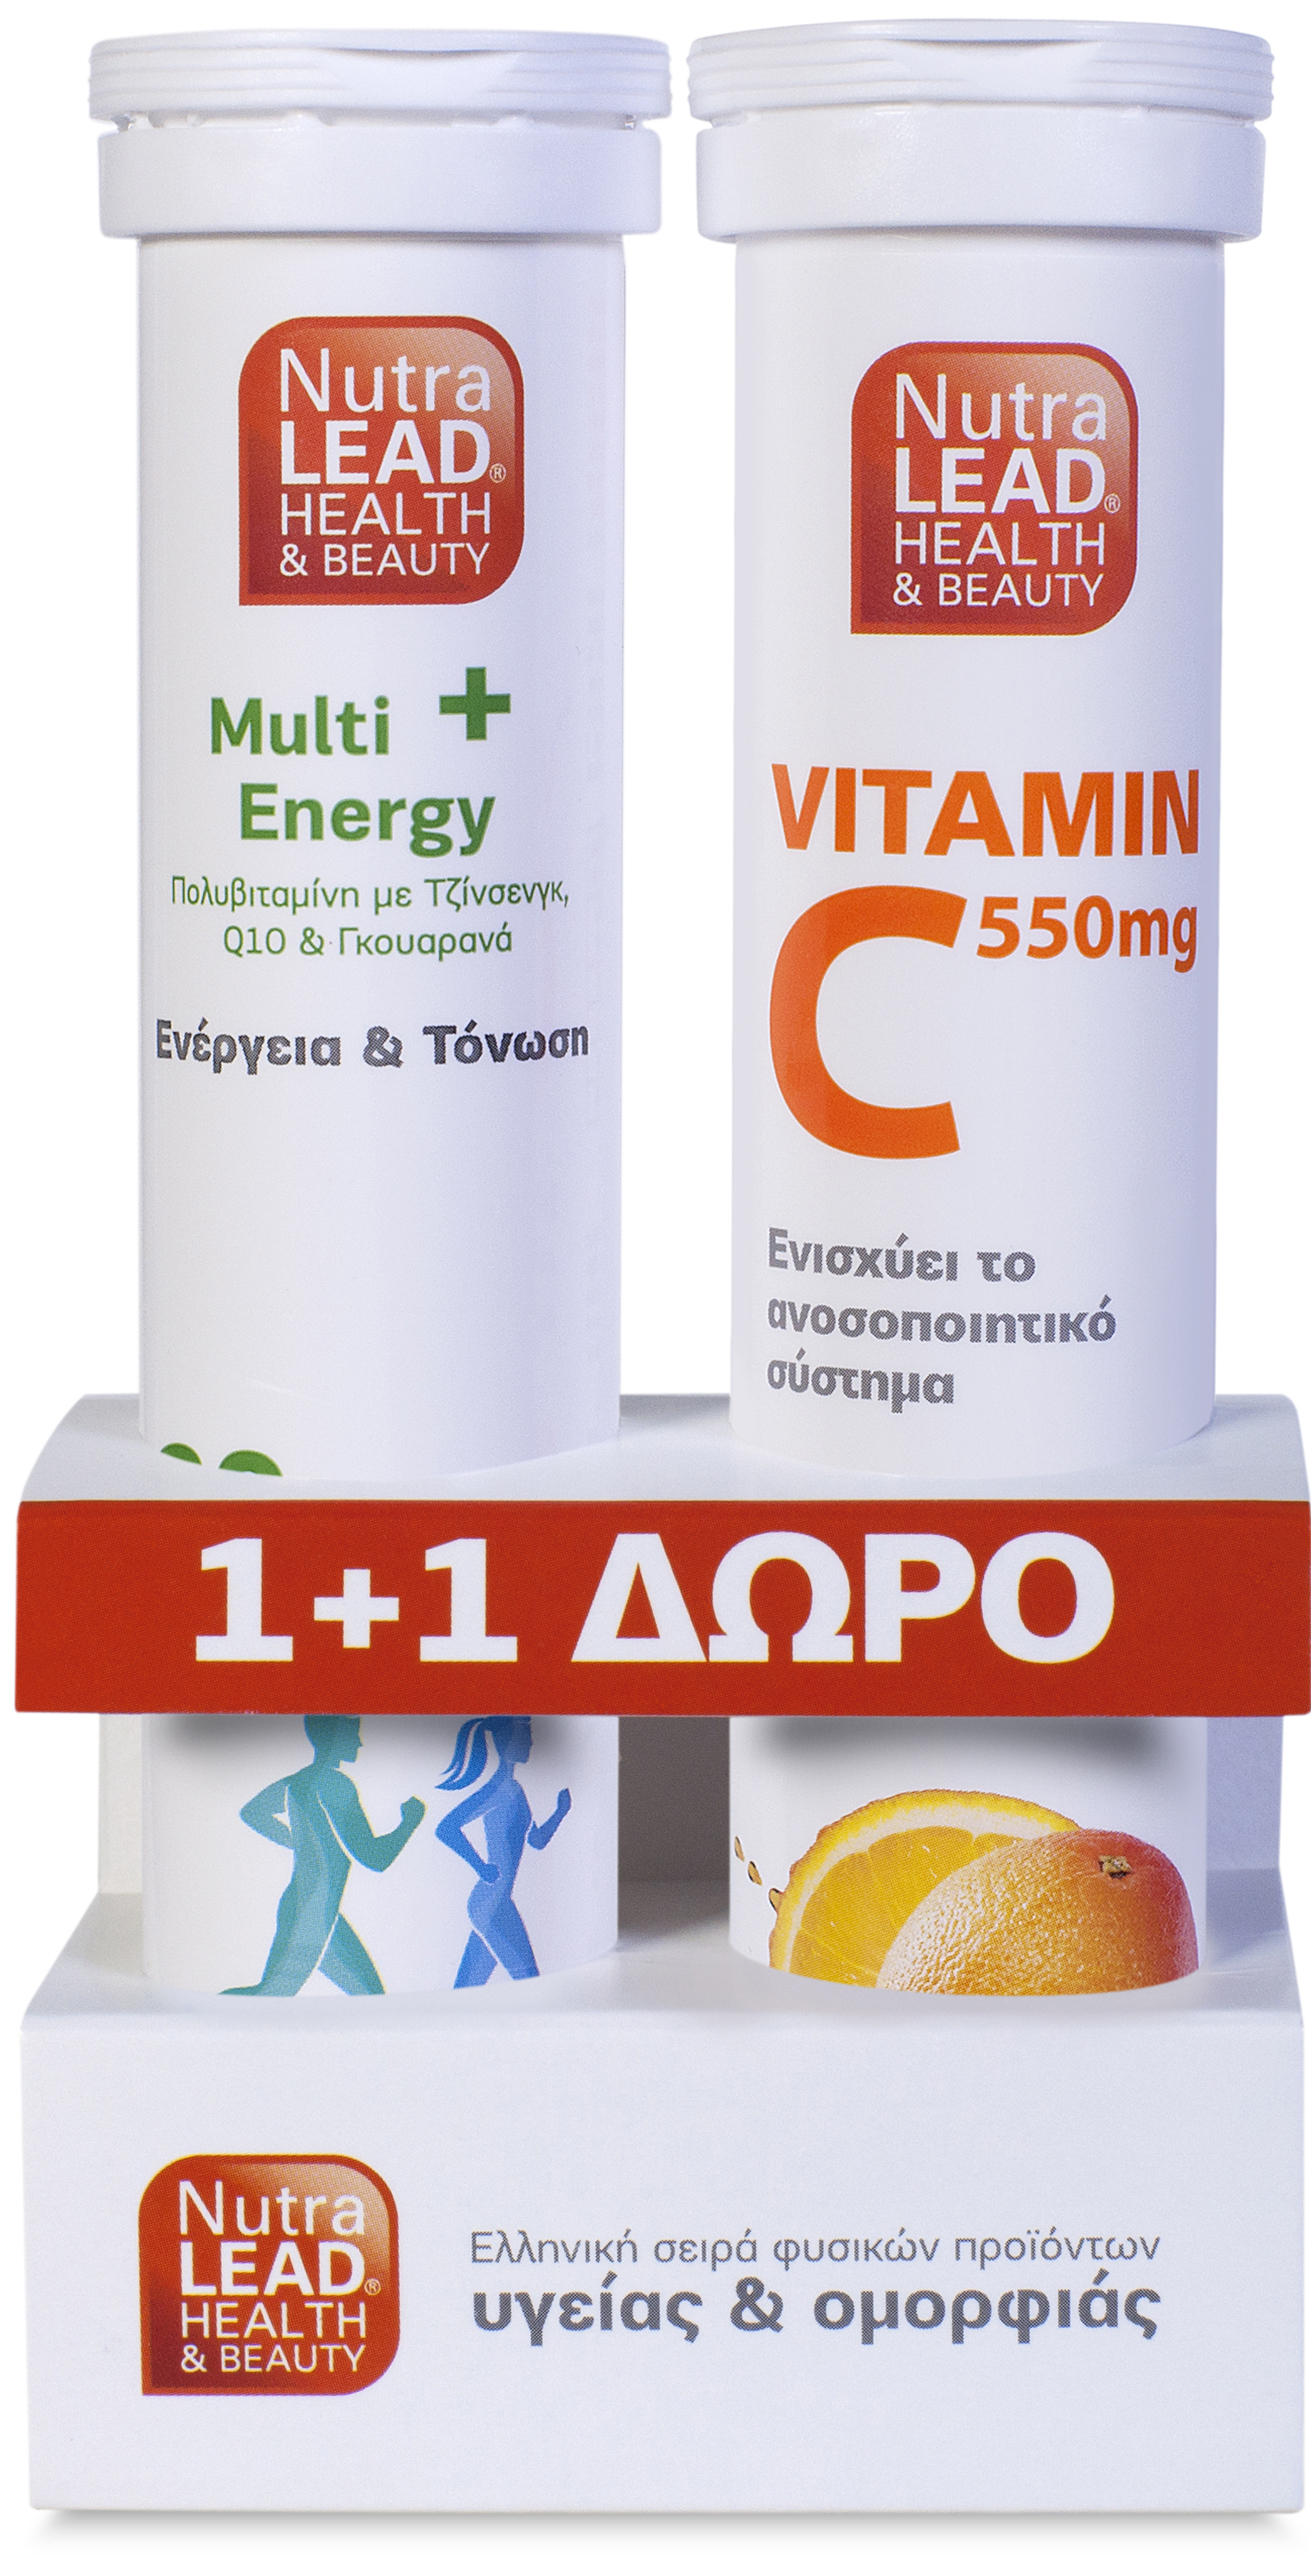 Nutralead Πακέτο Προσφοράς Multi+ Energy με Τζίνσενγκ,Q10 & Γκουαρανά 20Αναβρ.Δισκία + Βιταμίνη C 550mg – Πορτοκάλι 20Αν.Δισκία